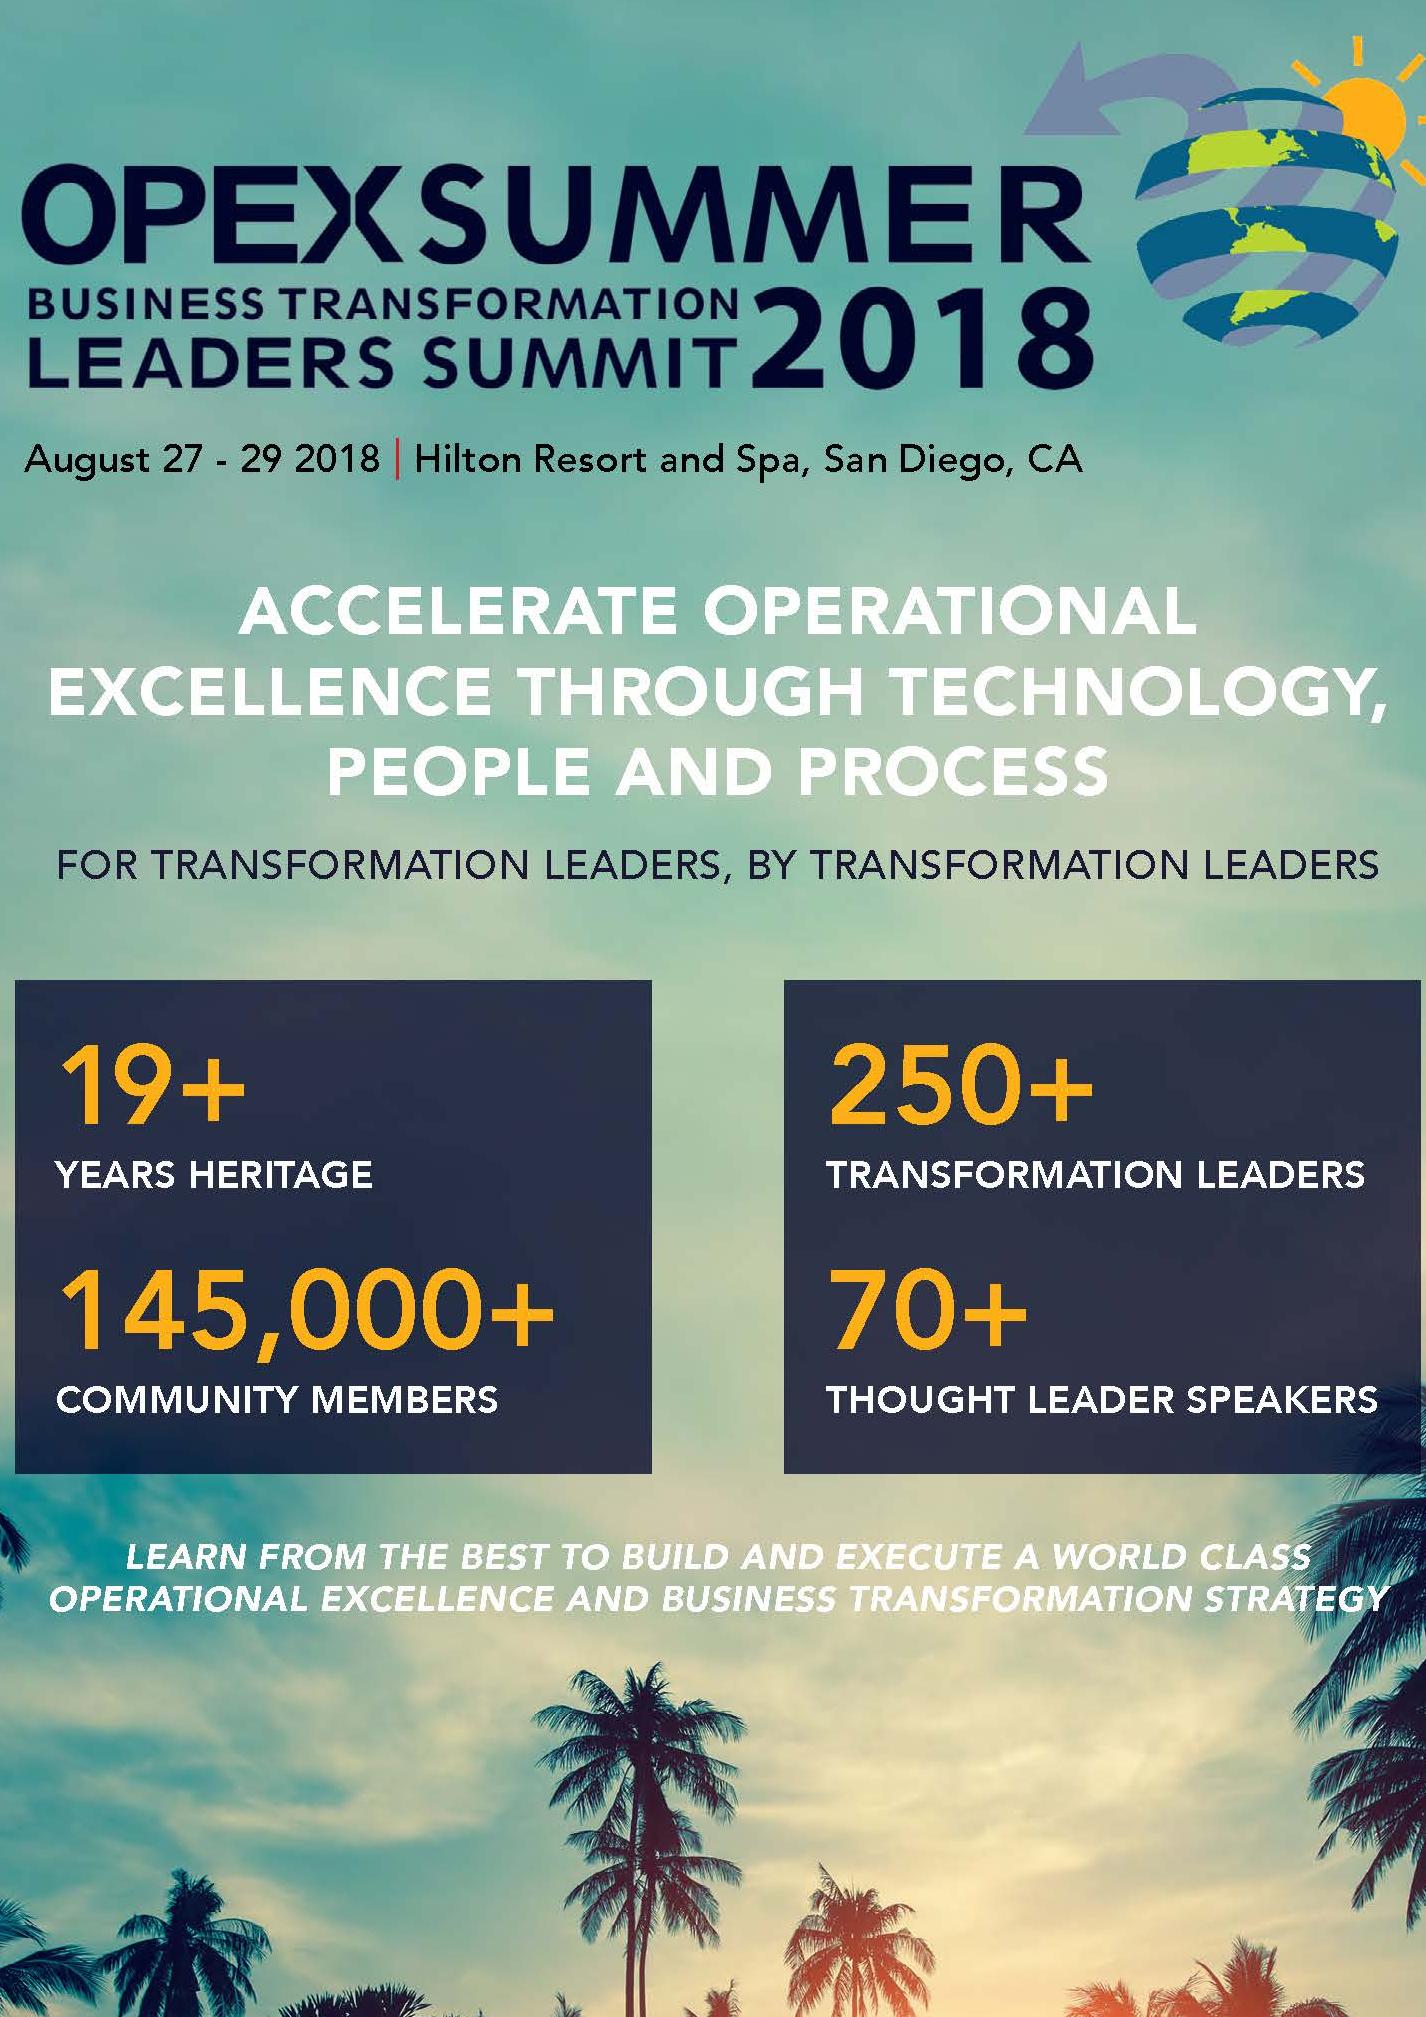 OPEX Summer 2018 Agenda